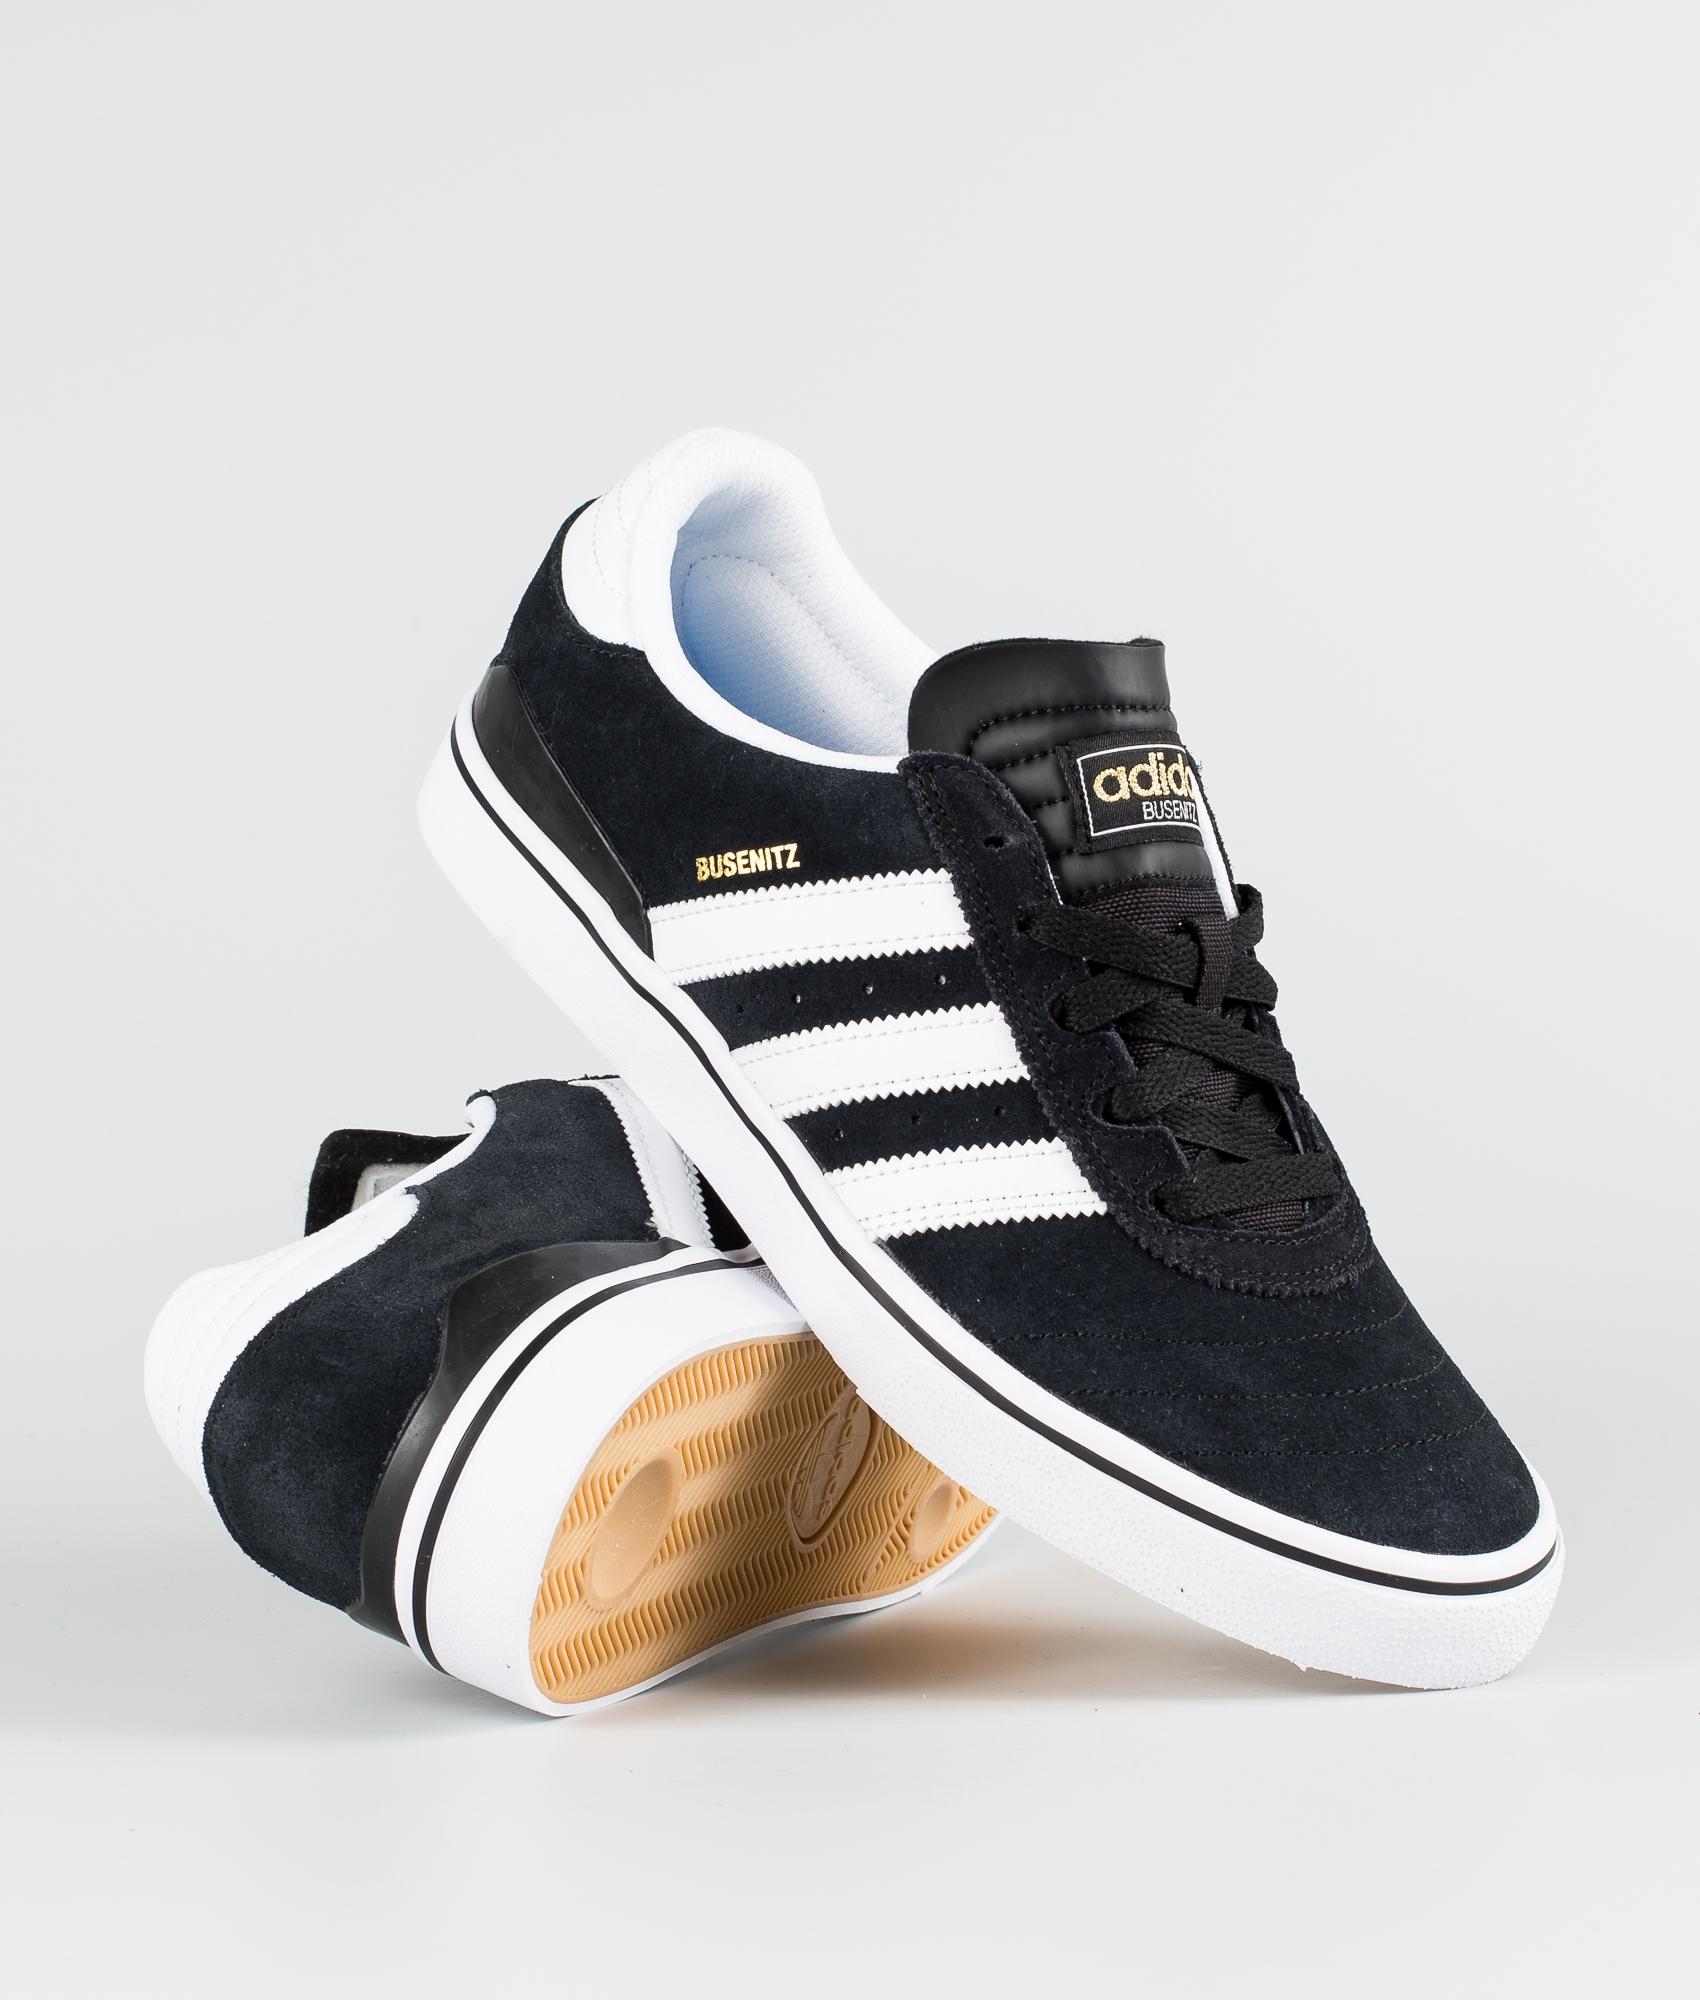 Black1running Busenitz Whiteblack1 Vulc Shoes Skateboarding Adidas srdQht